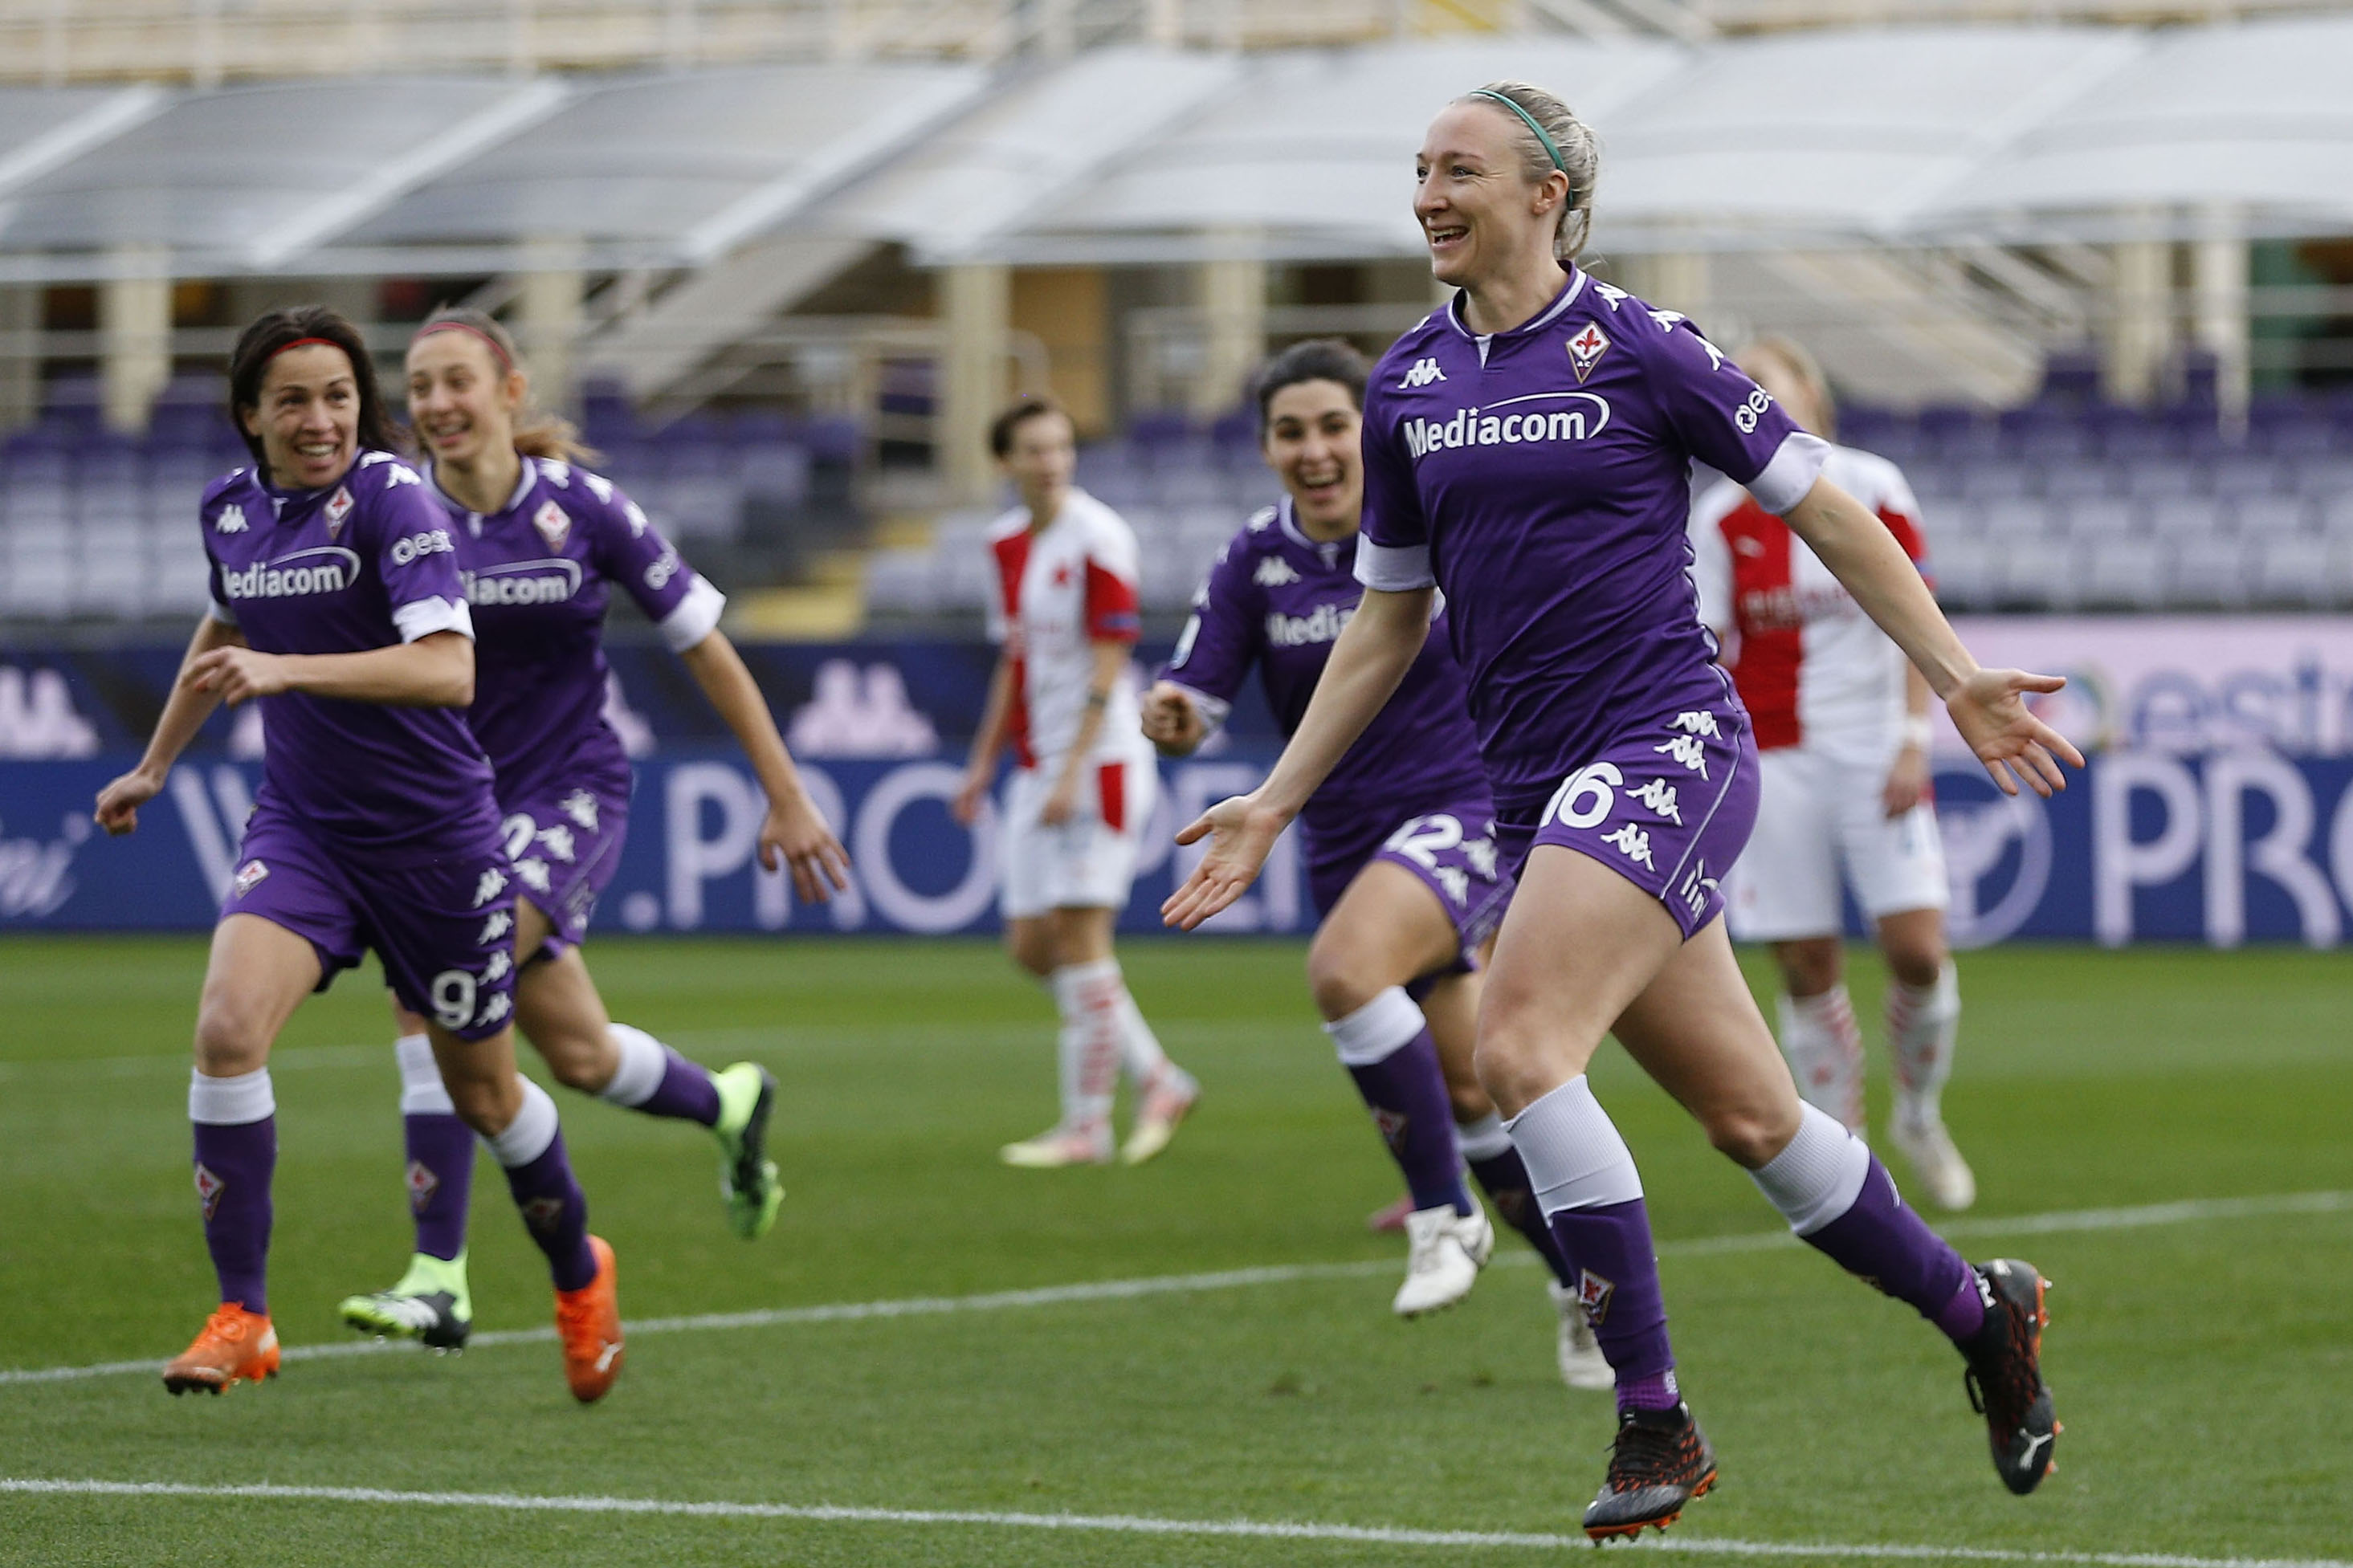 Fiorentina v Slavia Praha - UEFA Women's Champions League Round of 32: First Leg